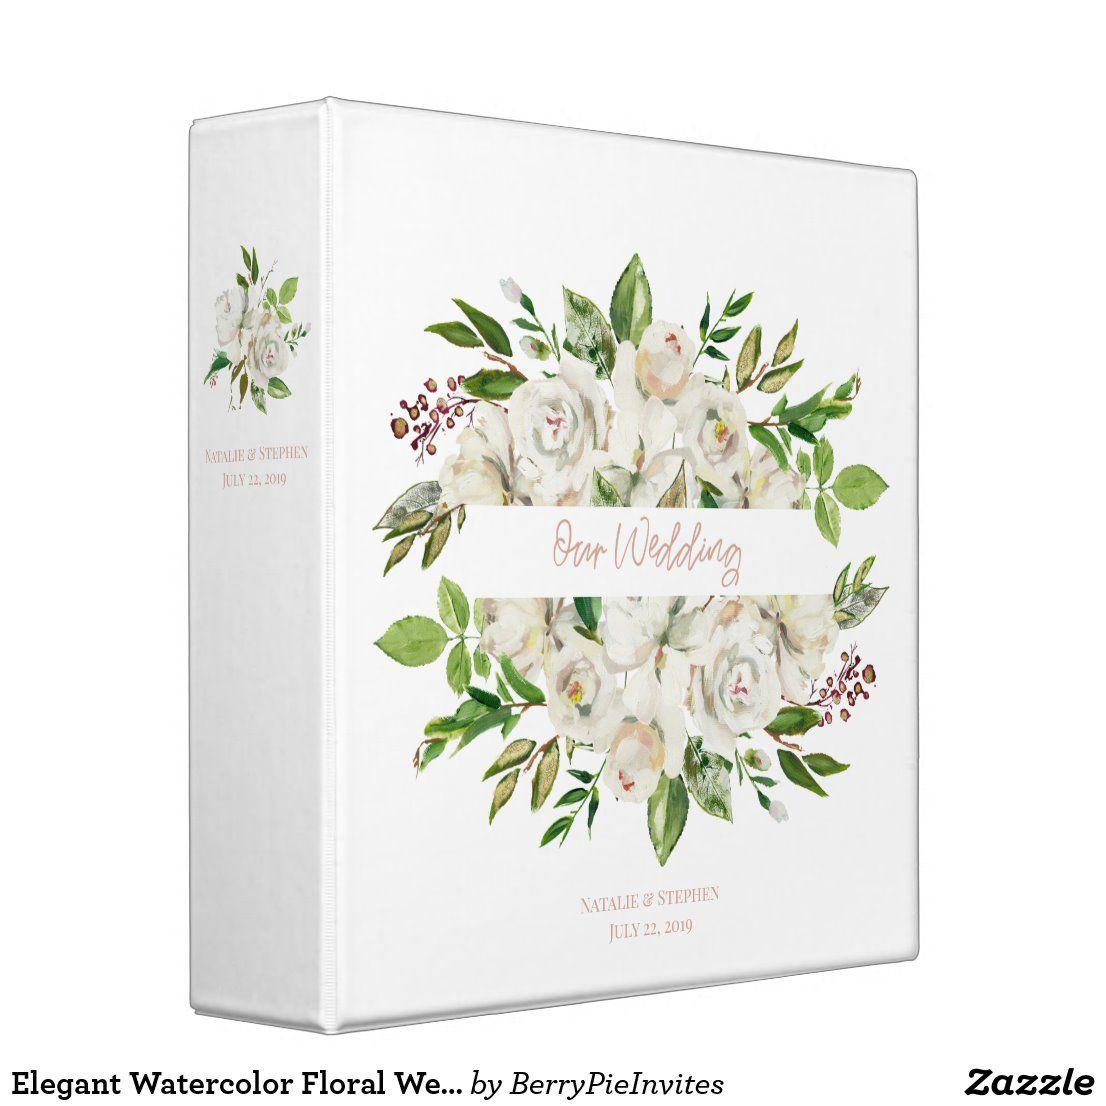 Elegant Watercolor Floral Wedding Photo Album 3 Ring